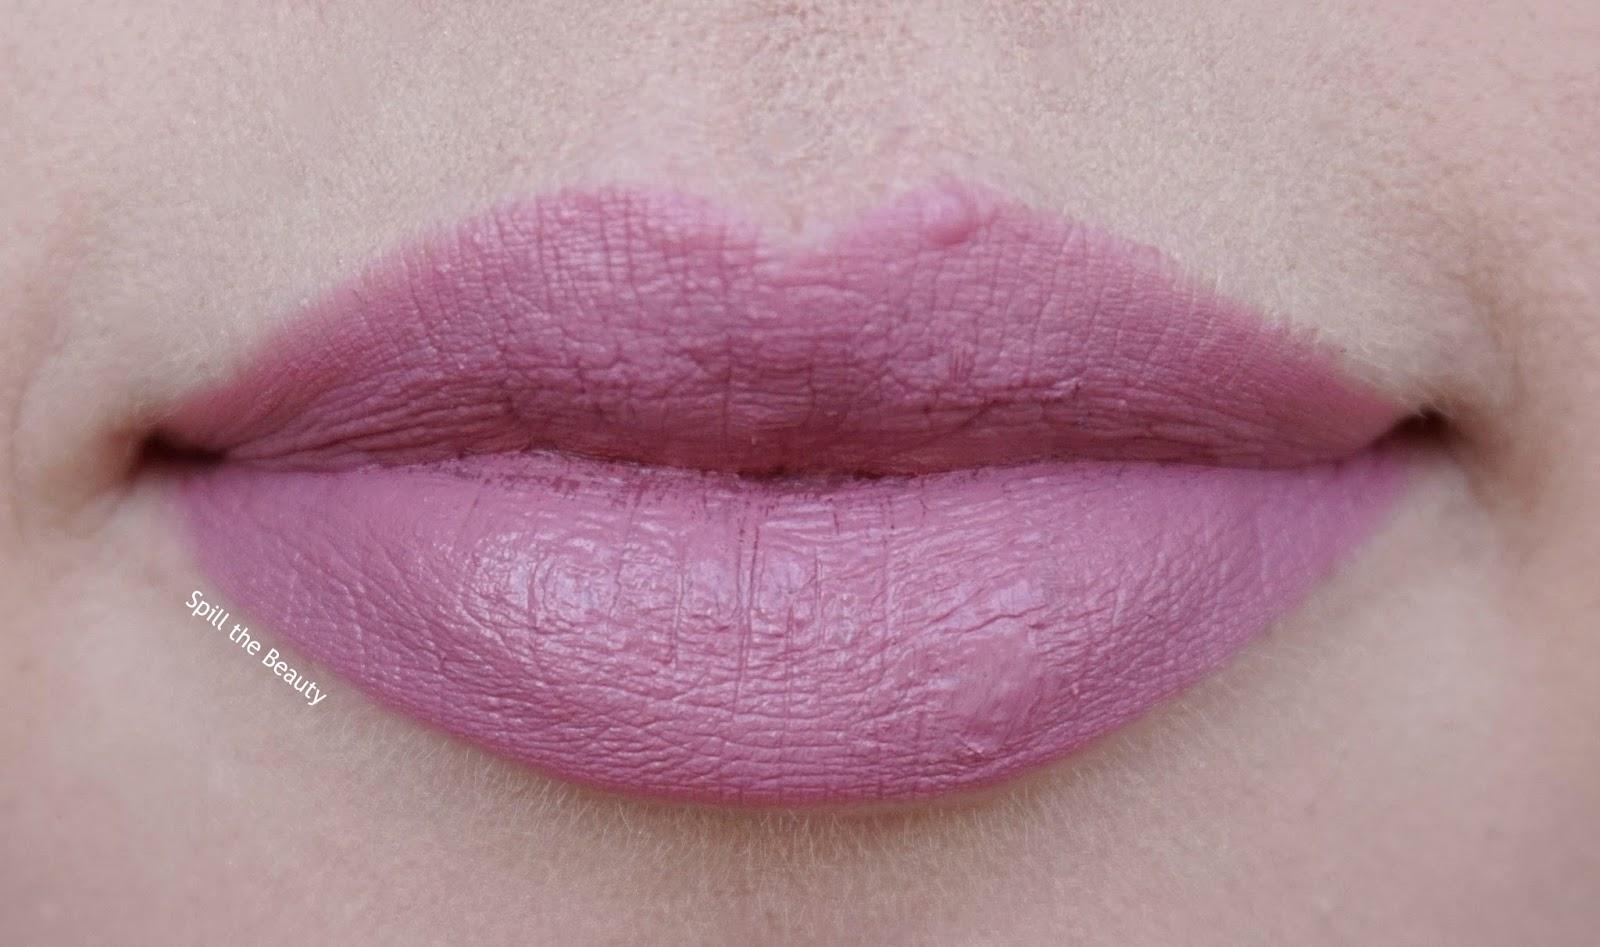 teeez cosmetics fashion venedetta review swatches berlin sunrise cool cerise scarlet adrenaline